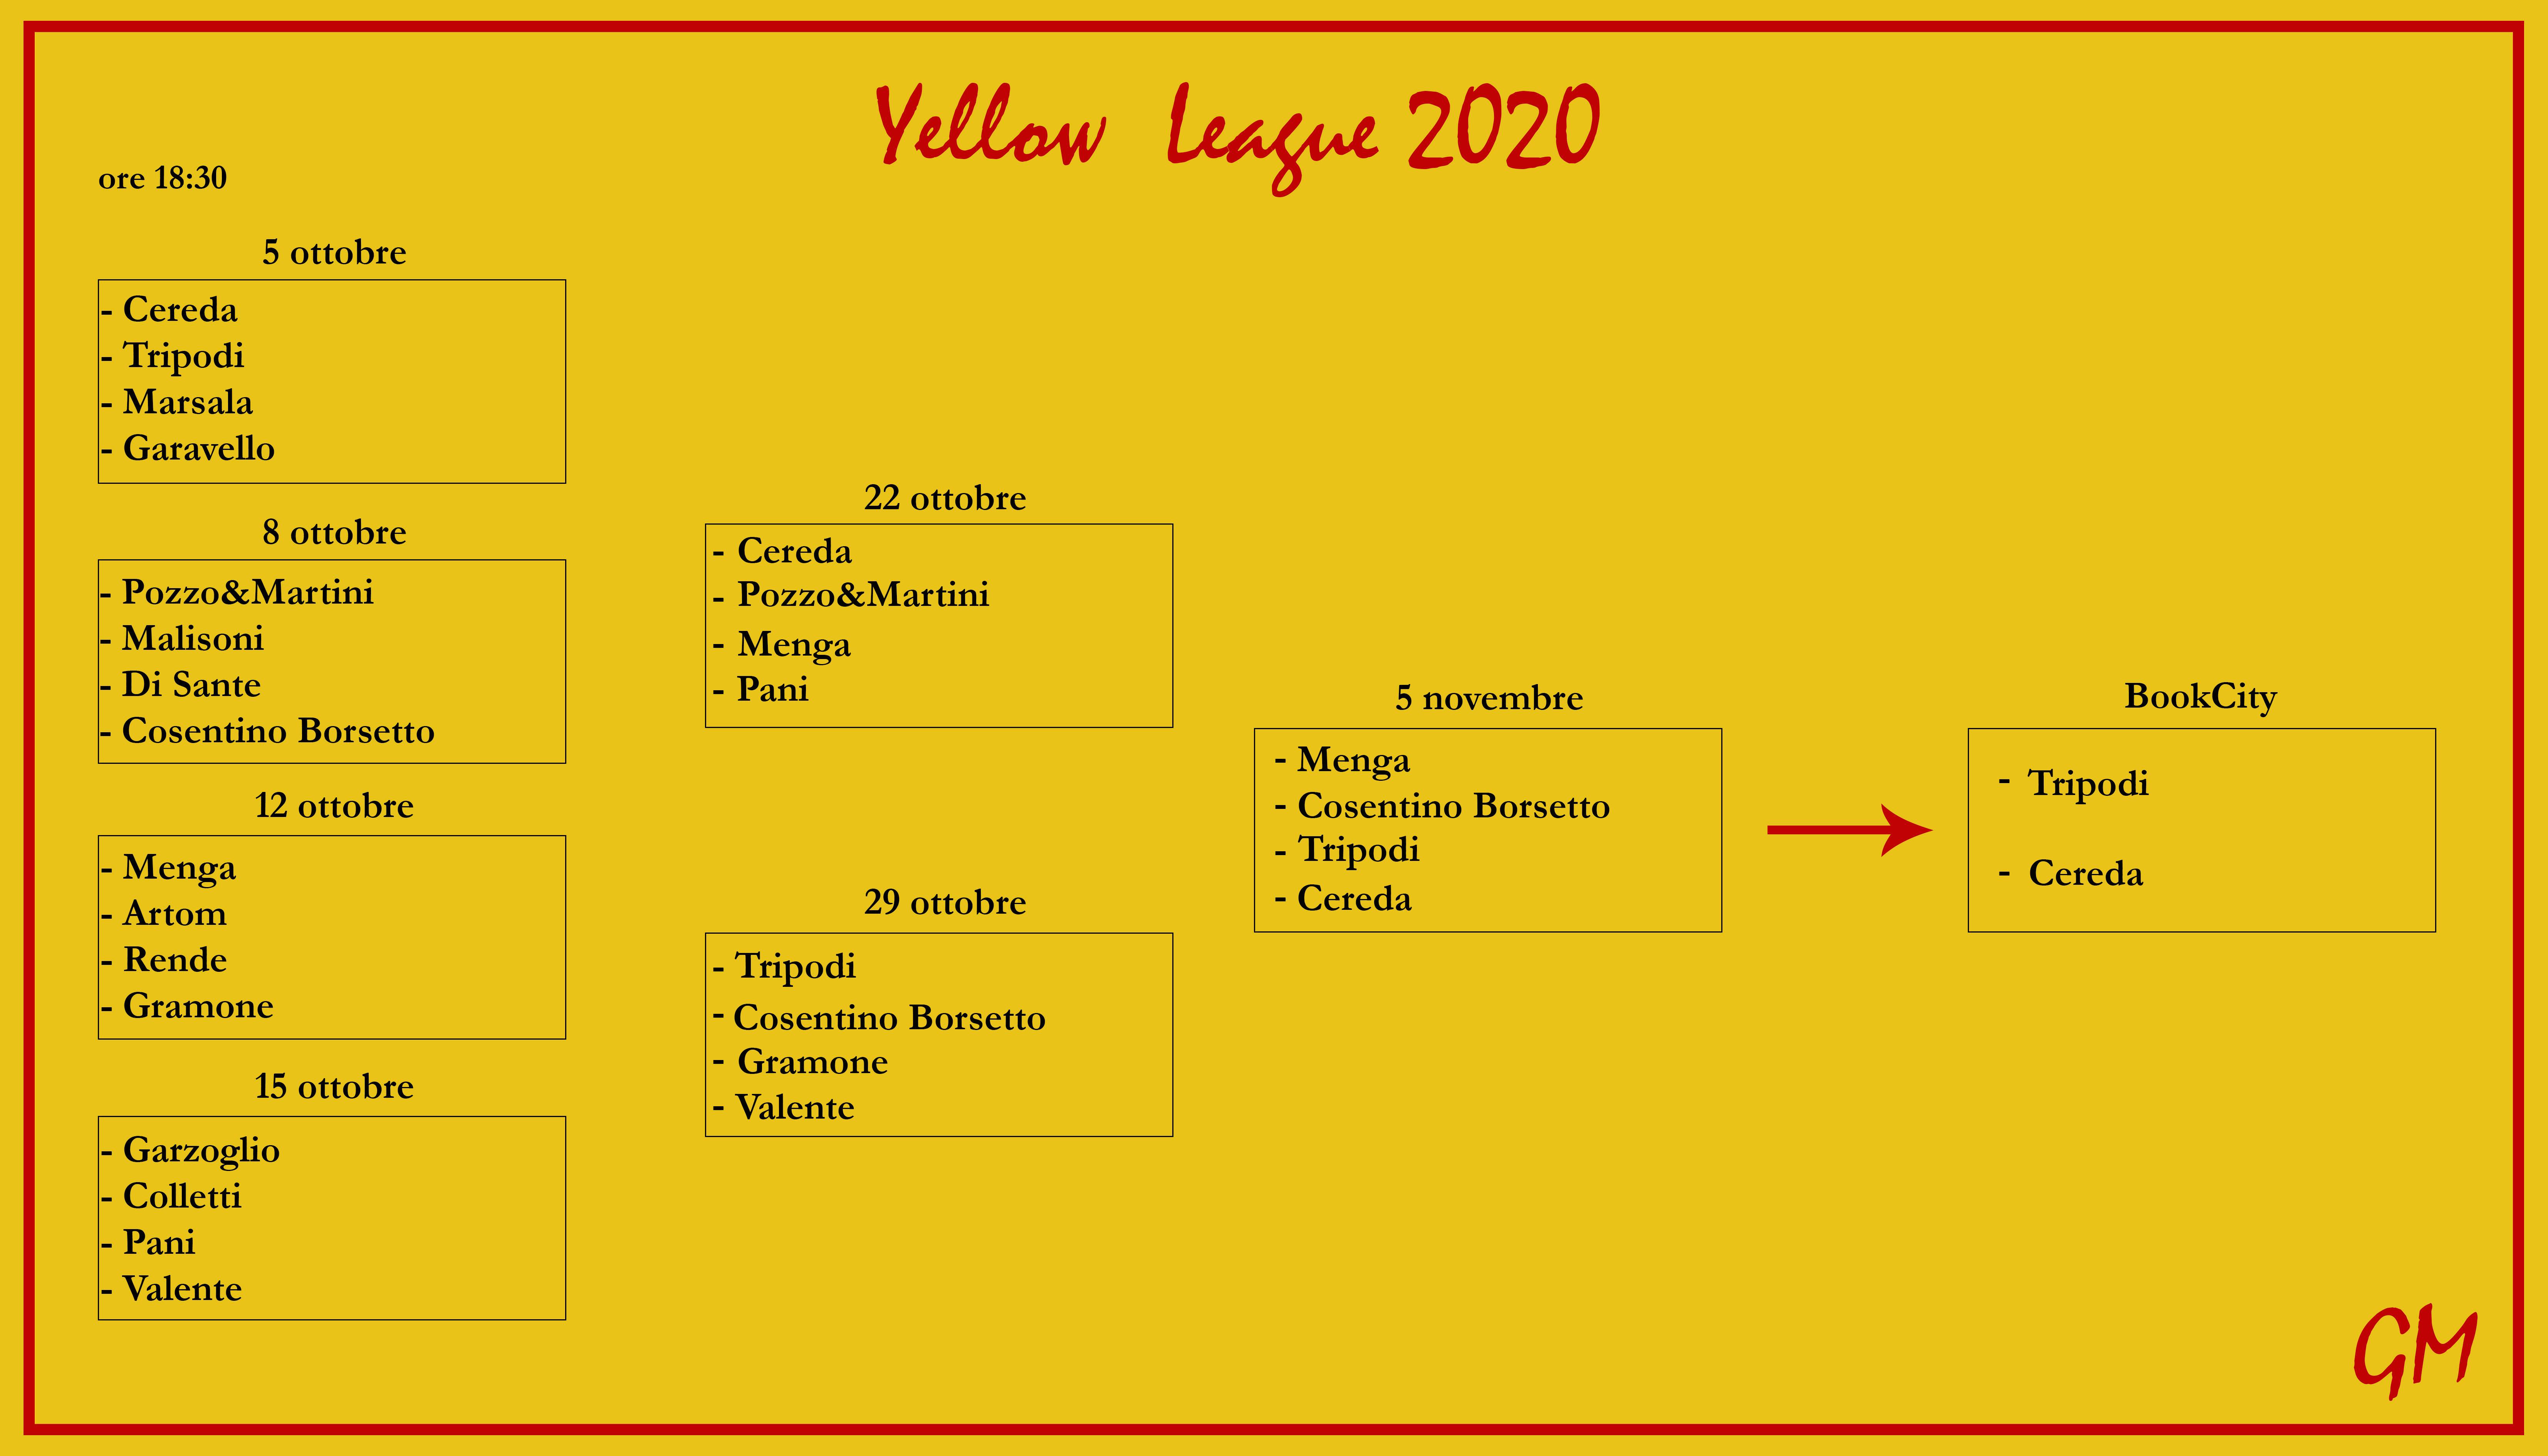 Yellow League 2020 finale